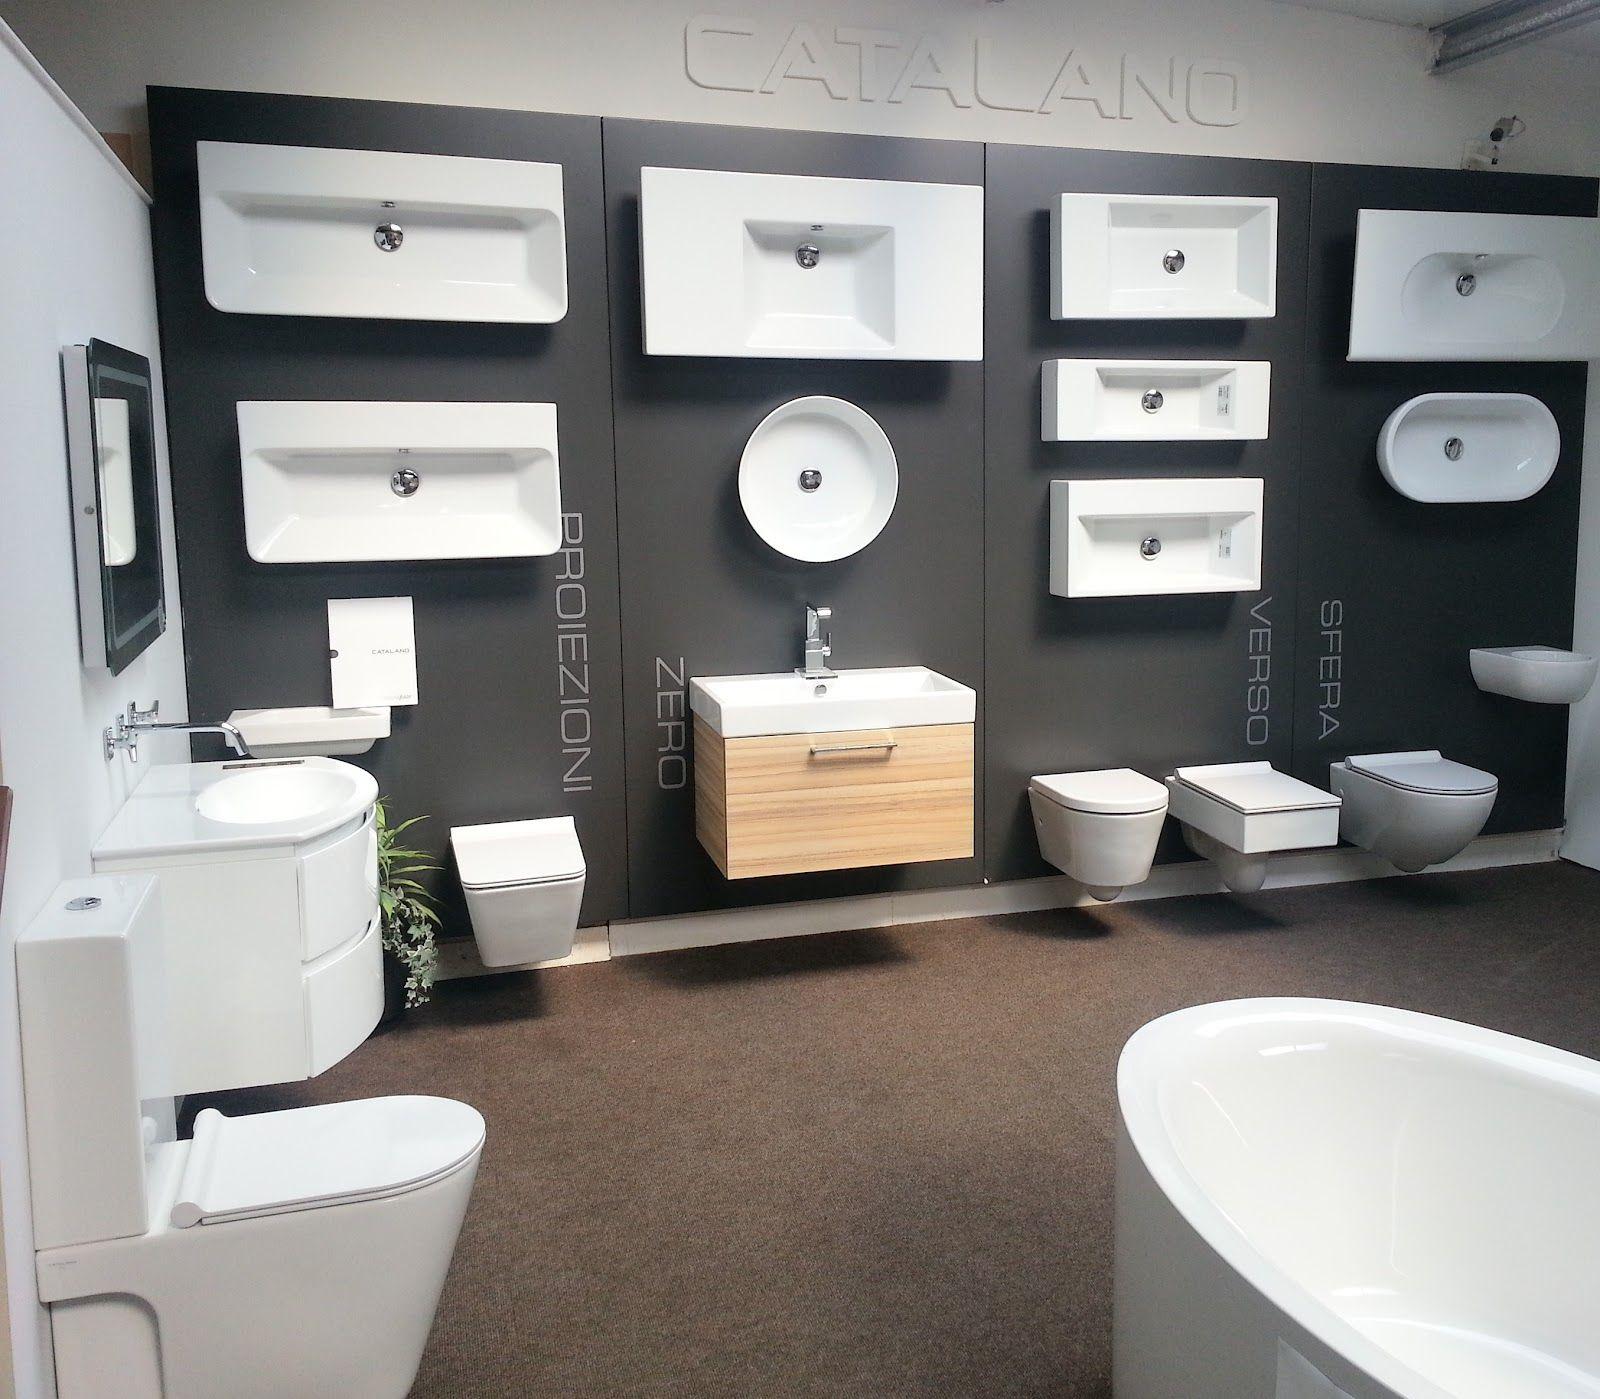 Bathroom Design Showroom Plumbing Showroom Design  Google Search  National  Pinterest